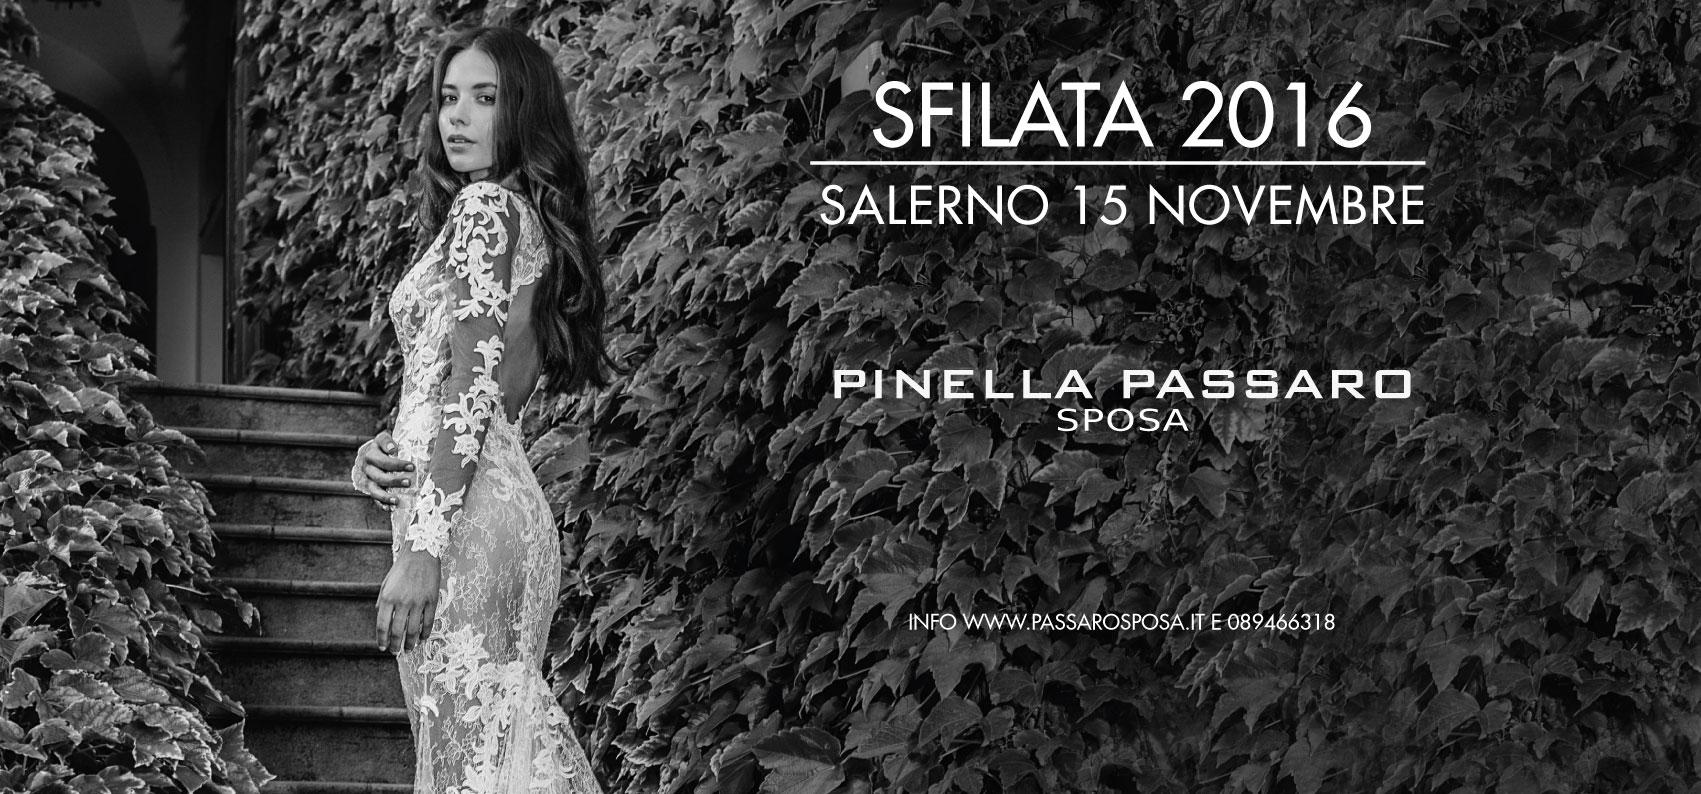 sfilata-salerno-pinella-passaro